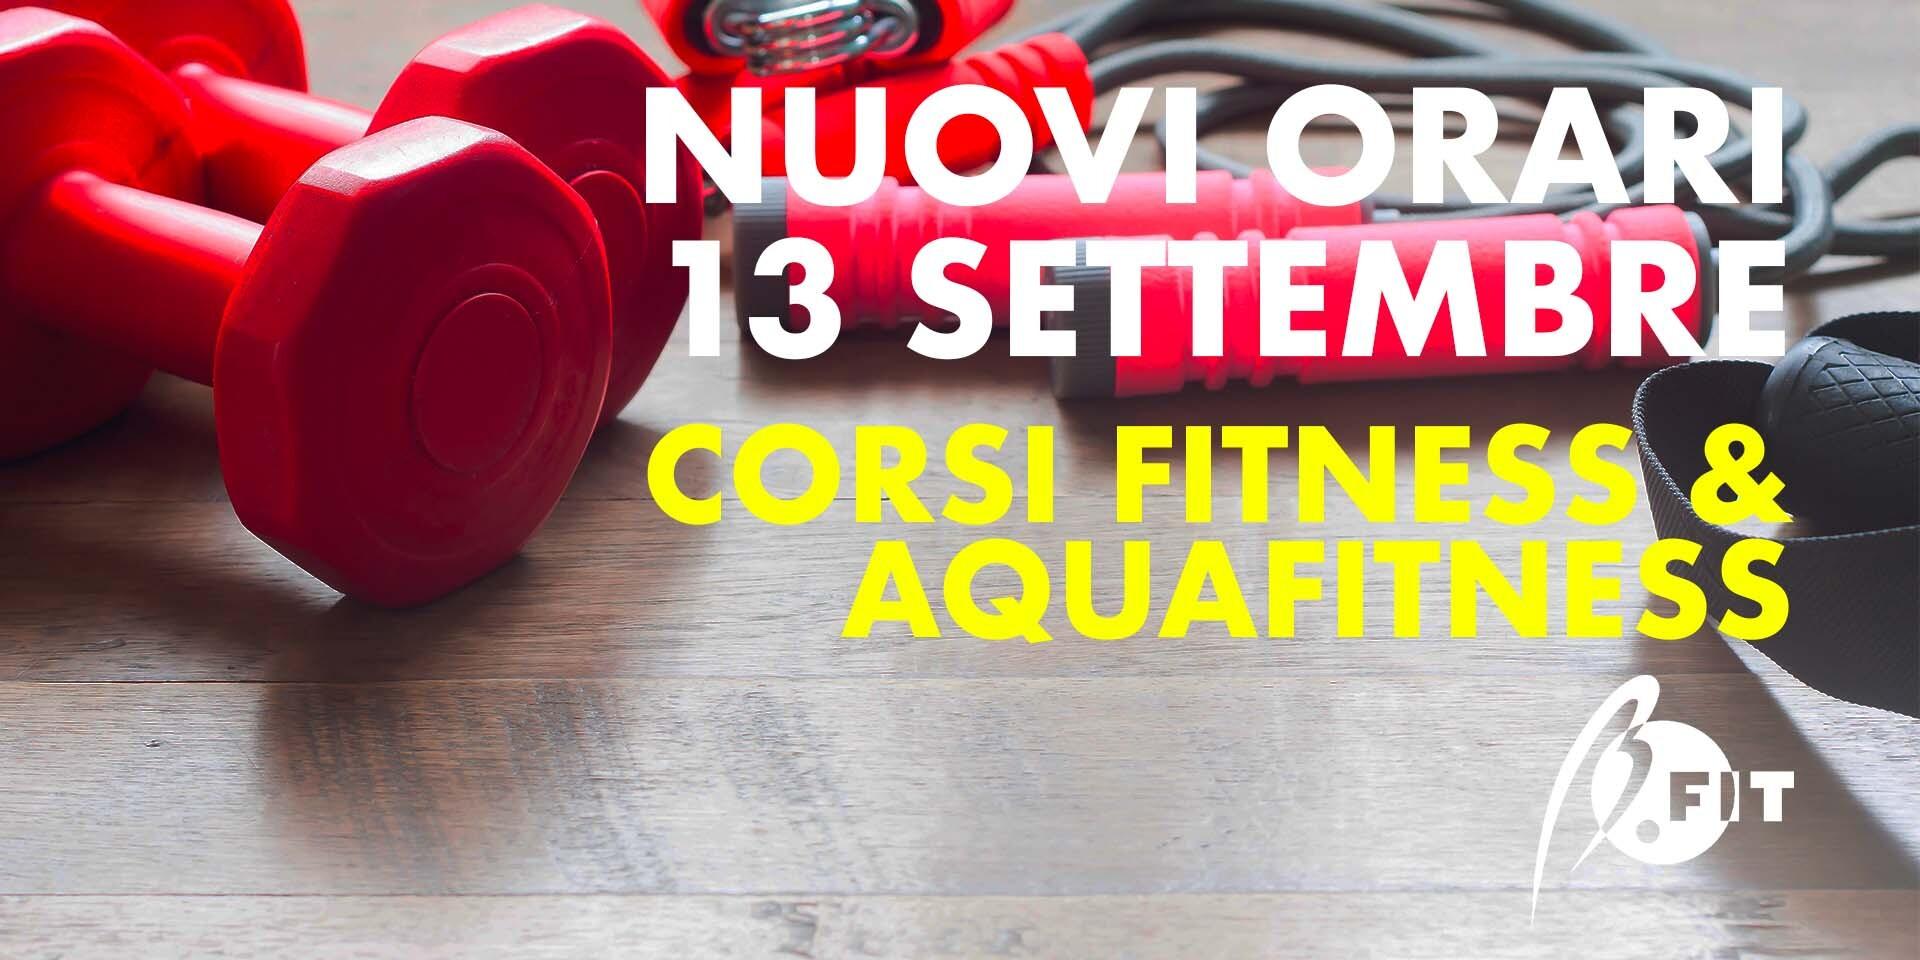 Banner nuovi orari corsi fitness&aquafitness dal 13/09/21